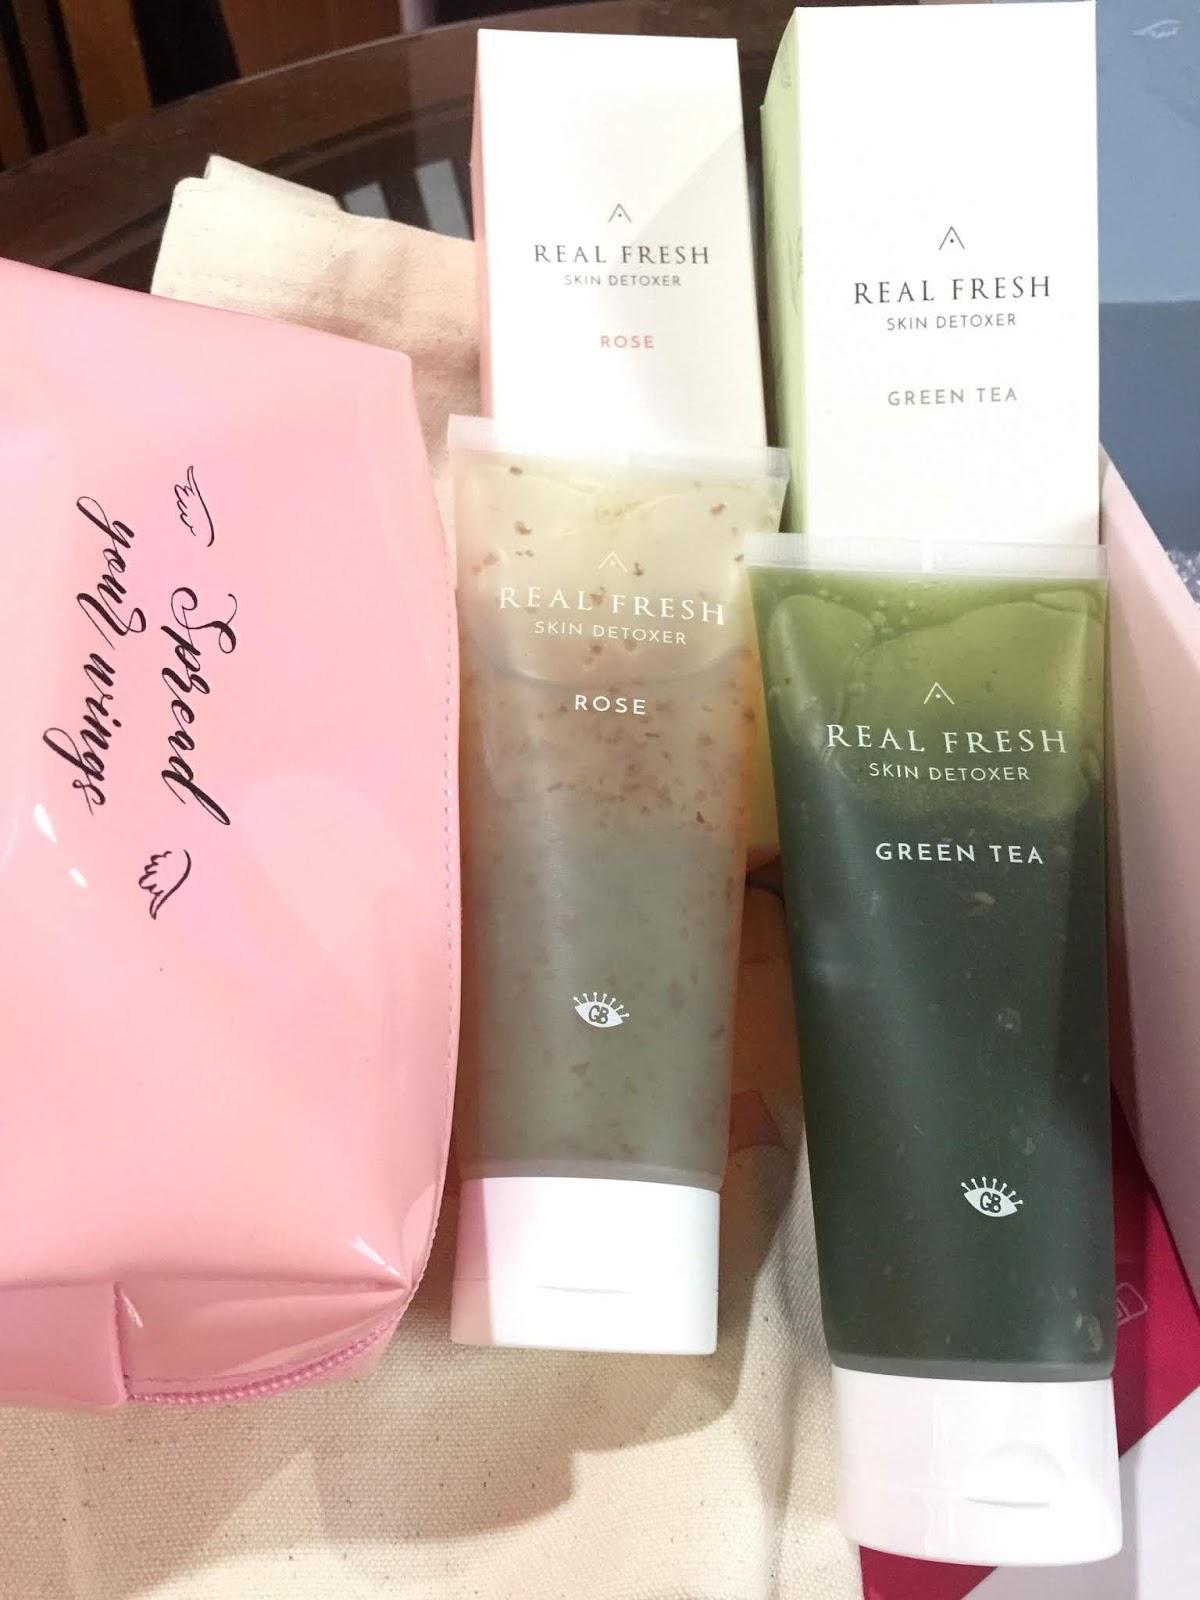 skin detox, perawatan wajah, althea angel, althea produk, khas untuk wanita